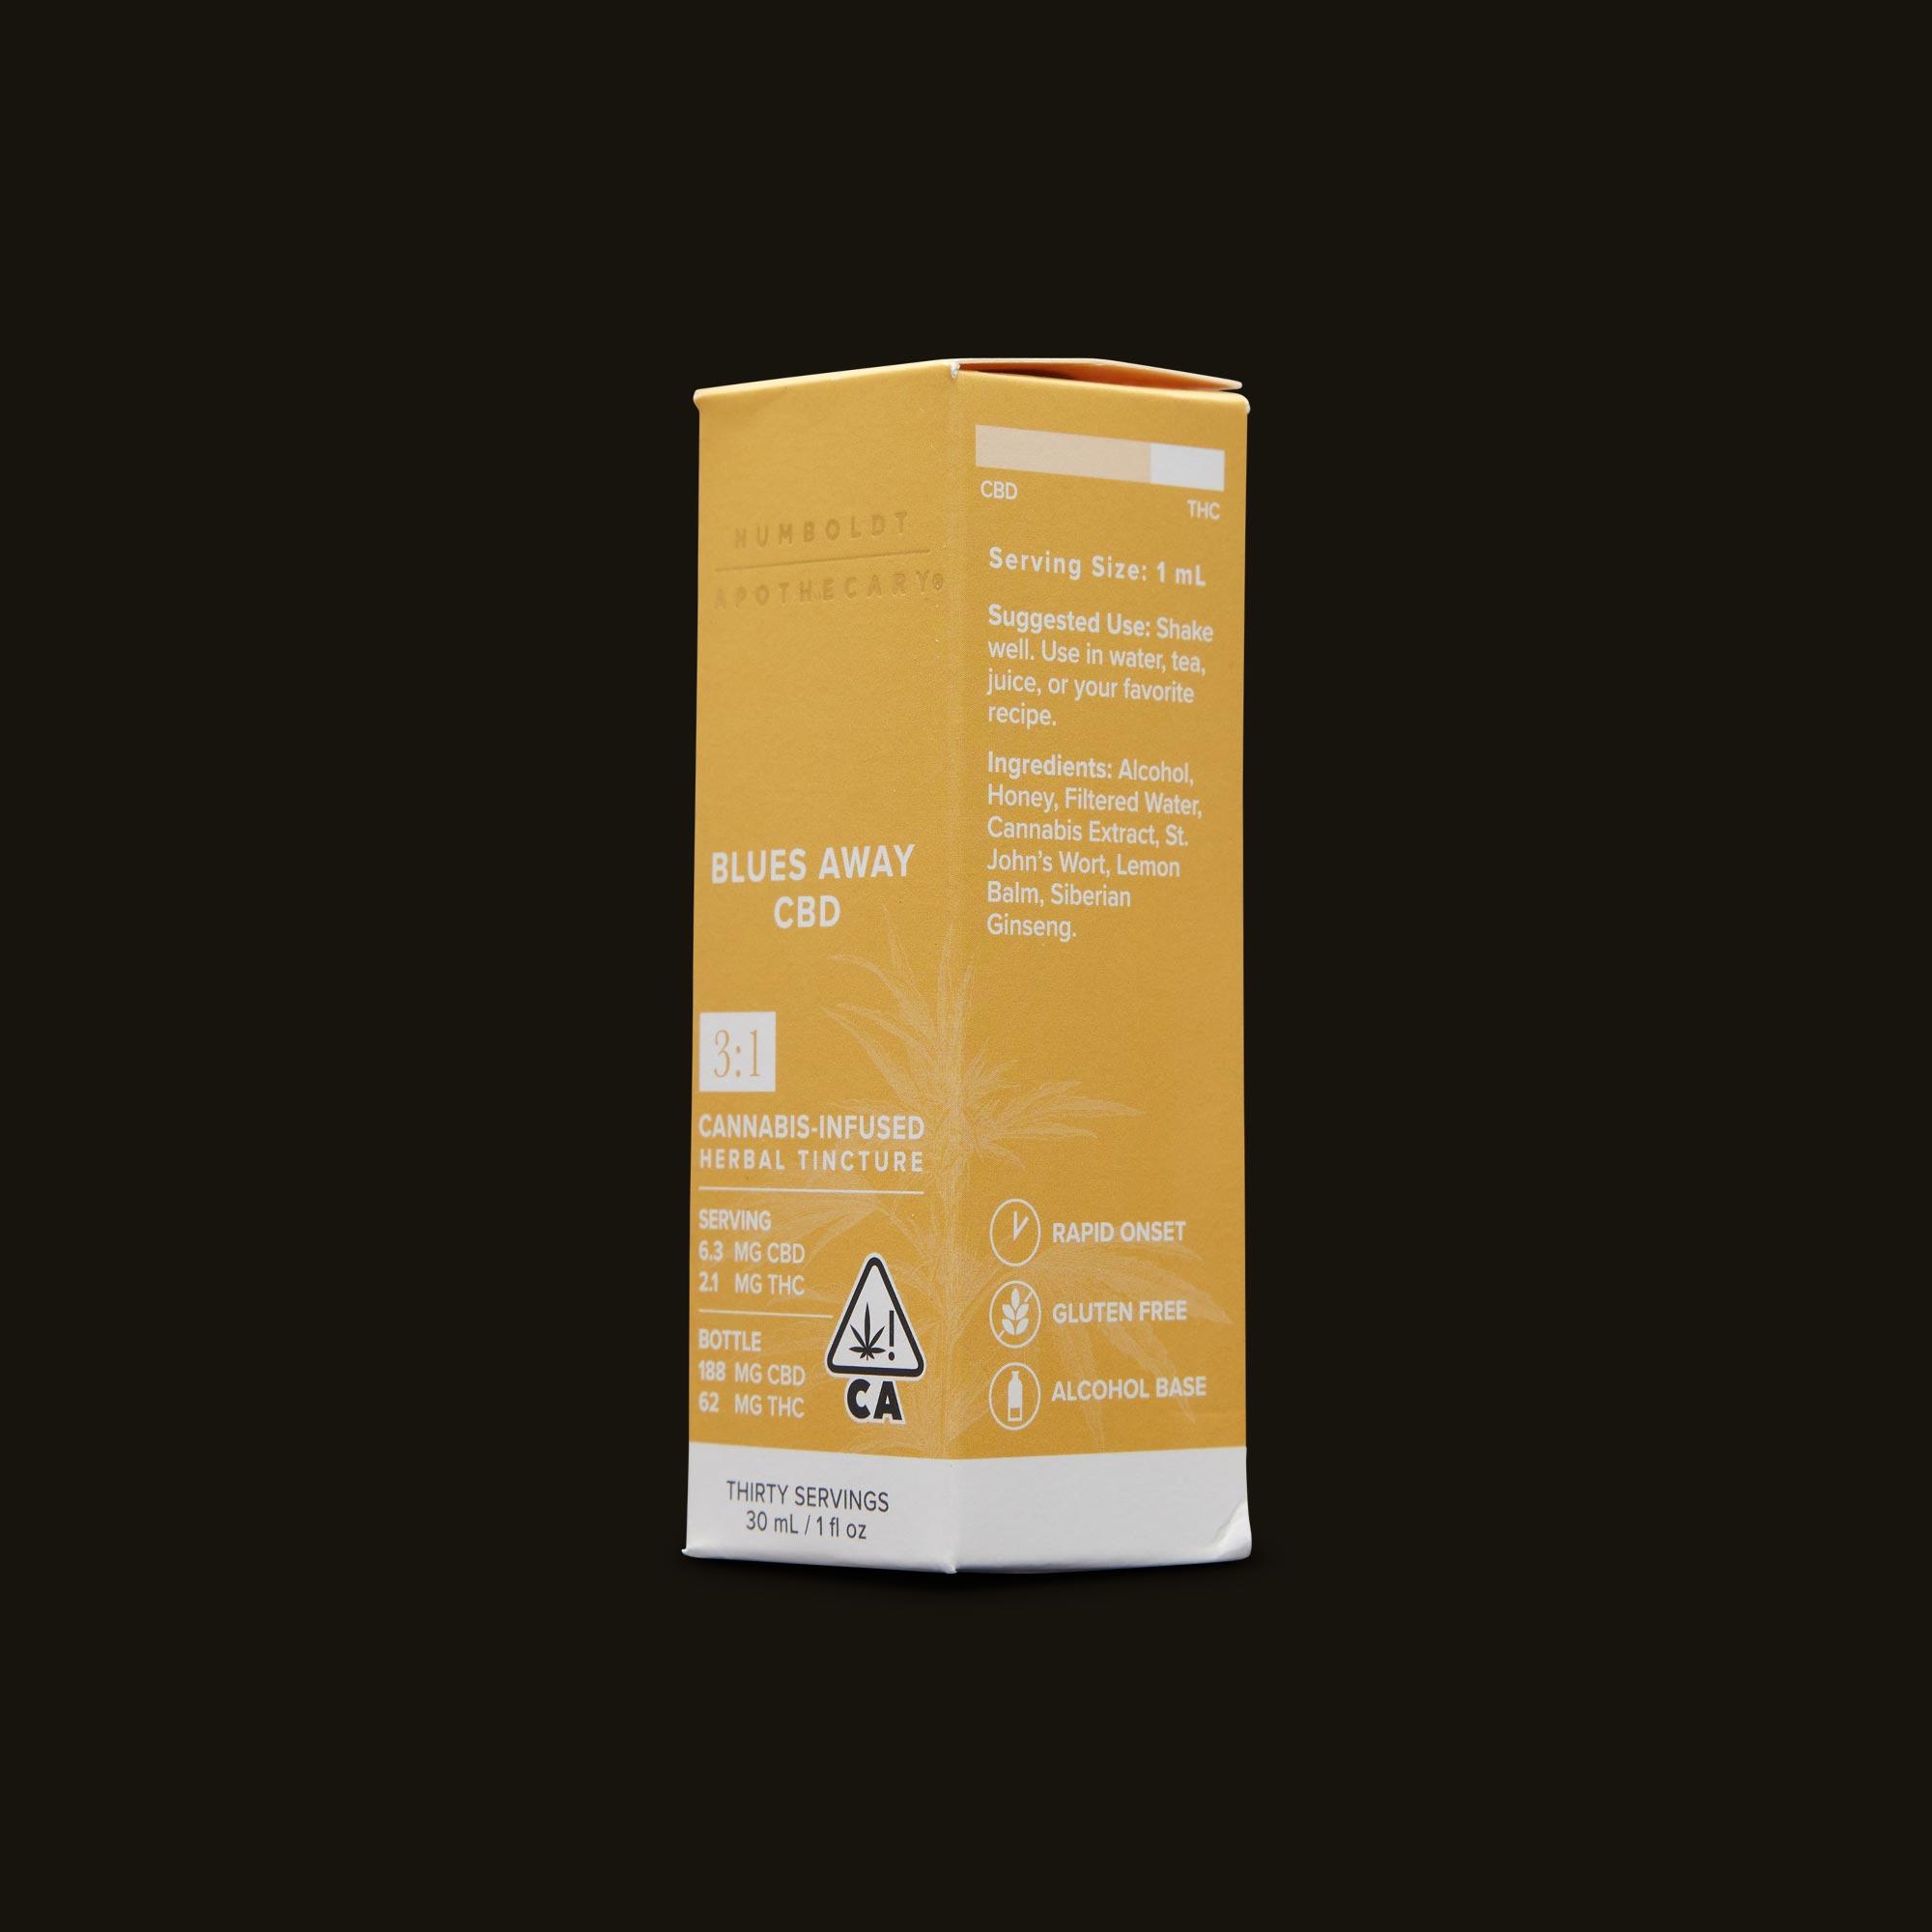 Humboldt Apothecary Blues Away CBD 3:1 Ingredients